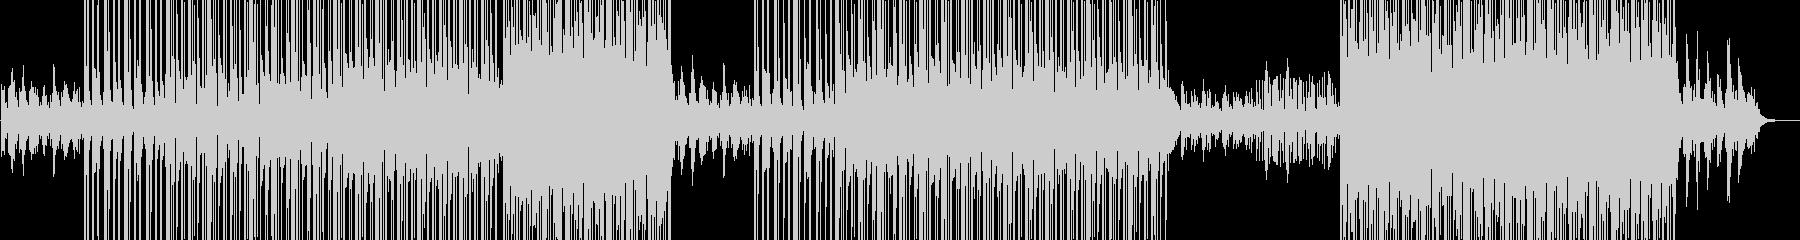 Hiphop/Pianoの未再生の波形